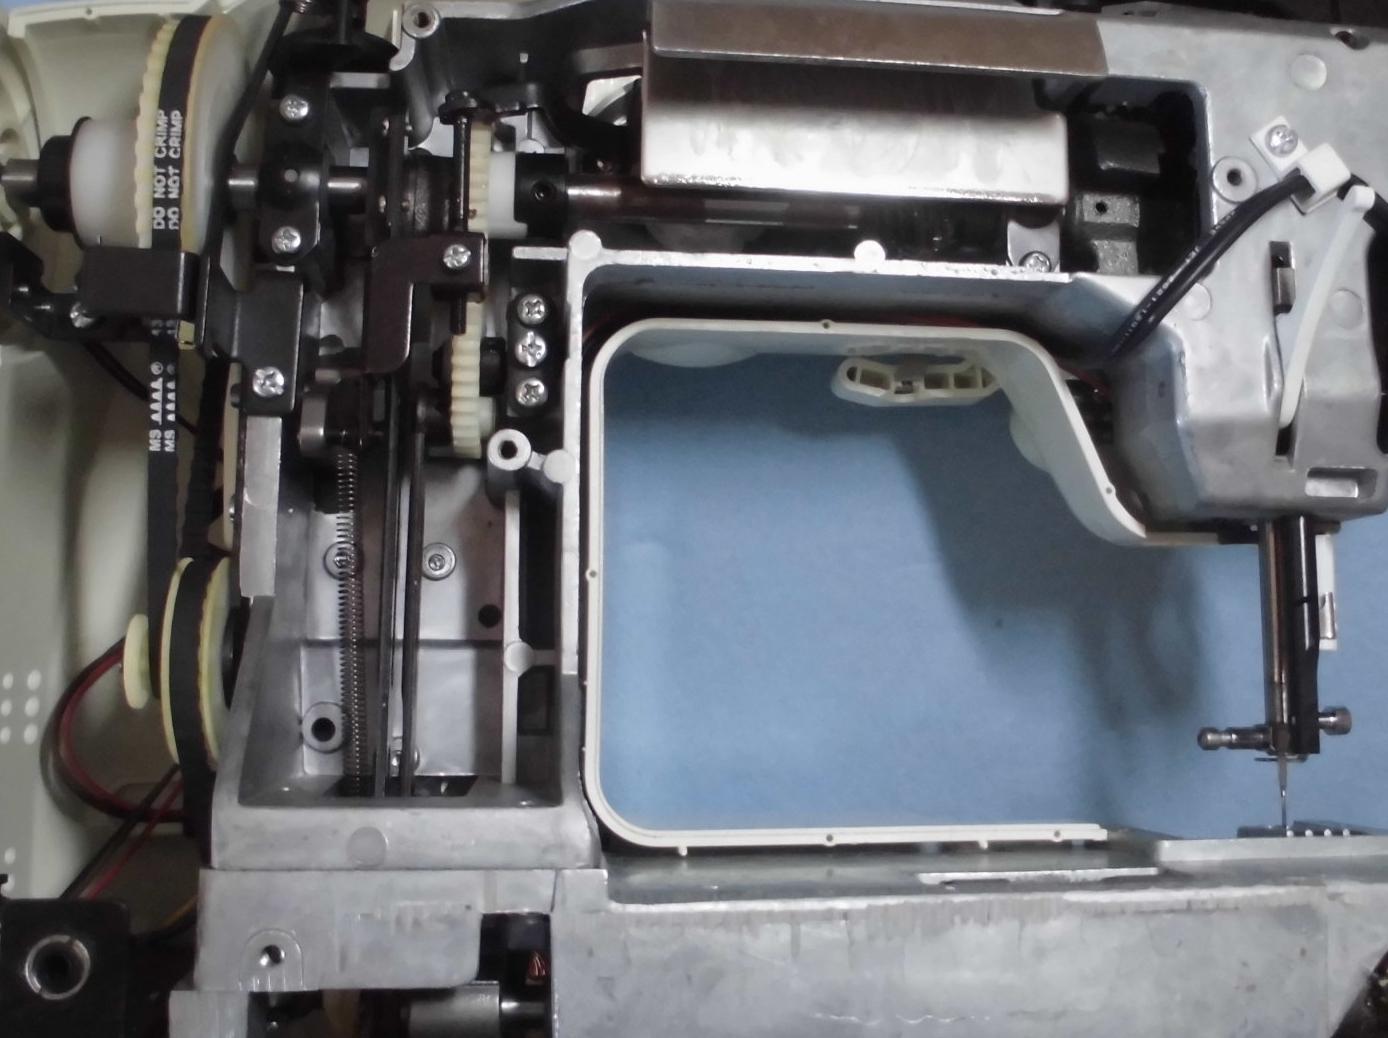 AG-002N|分解オーバーホールメンテナンス修理|アックスヤマザキミシン